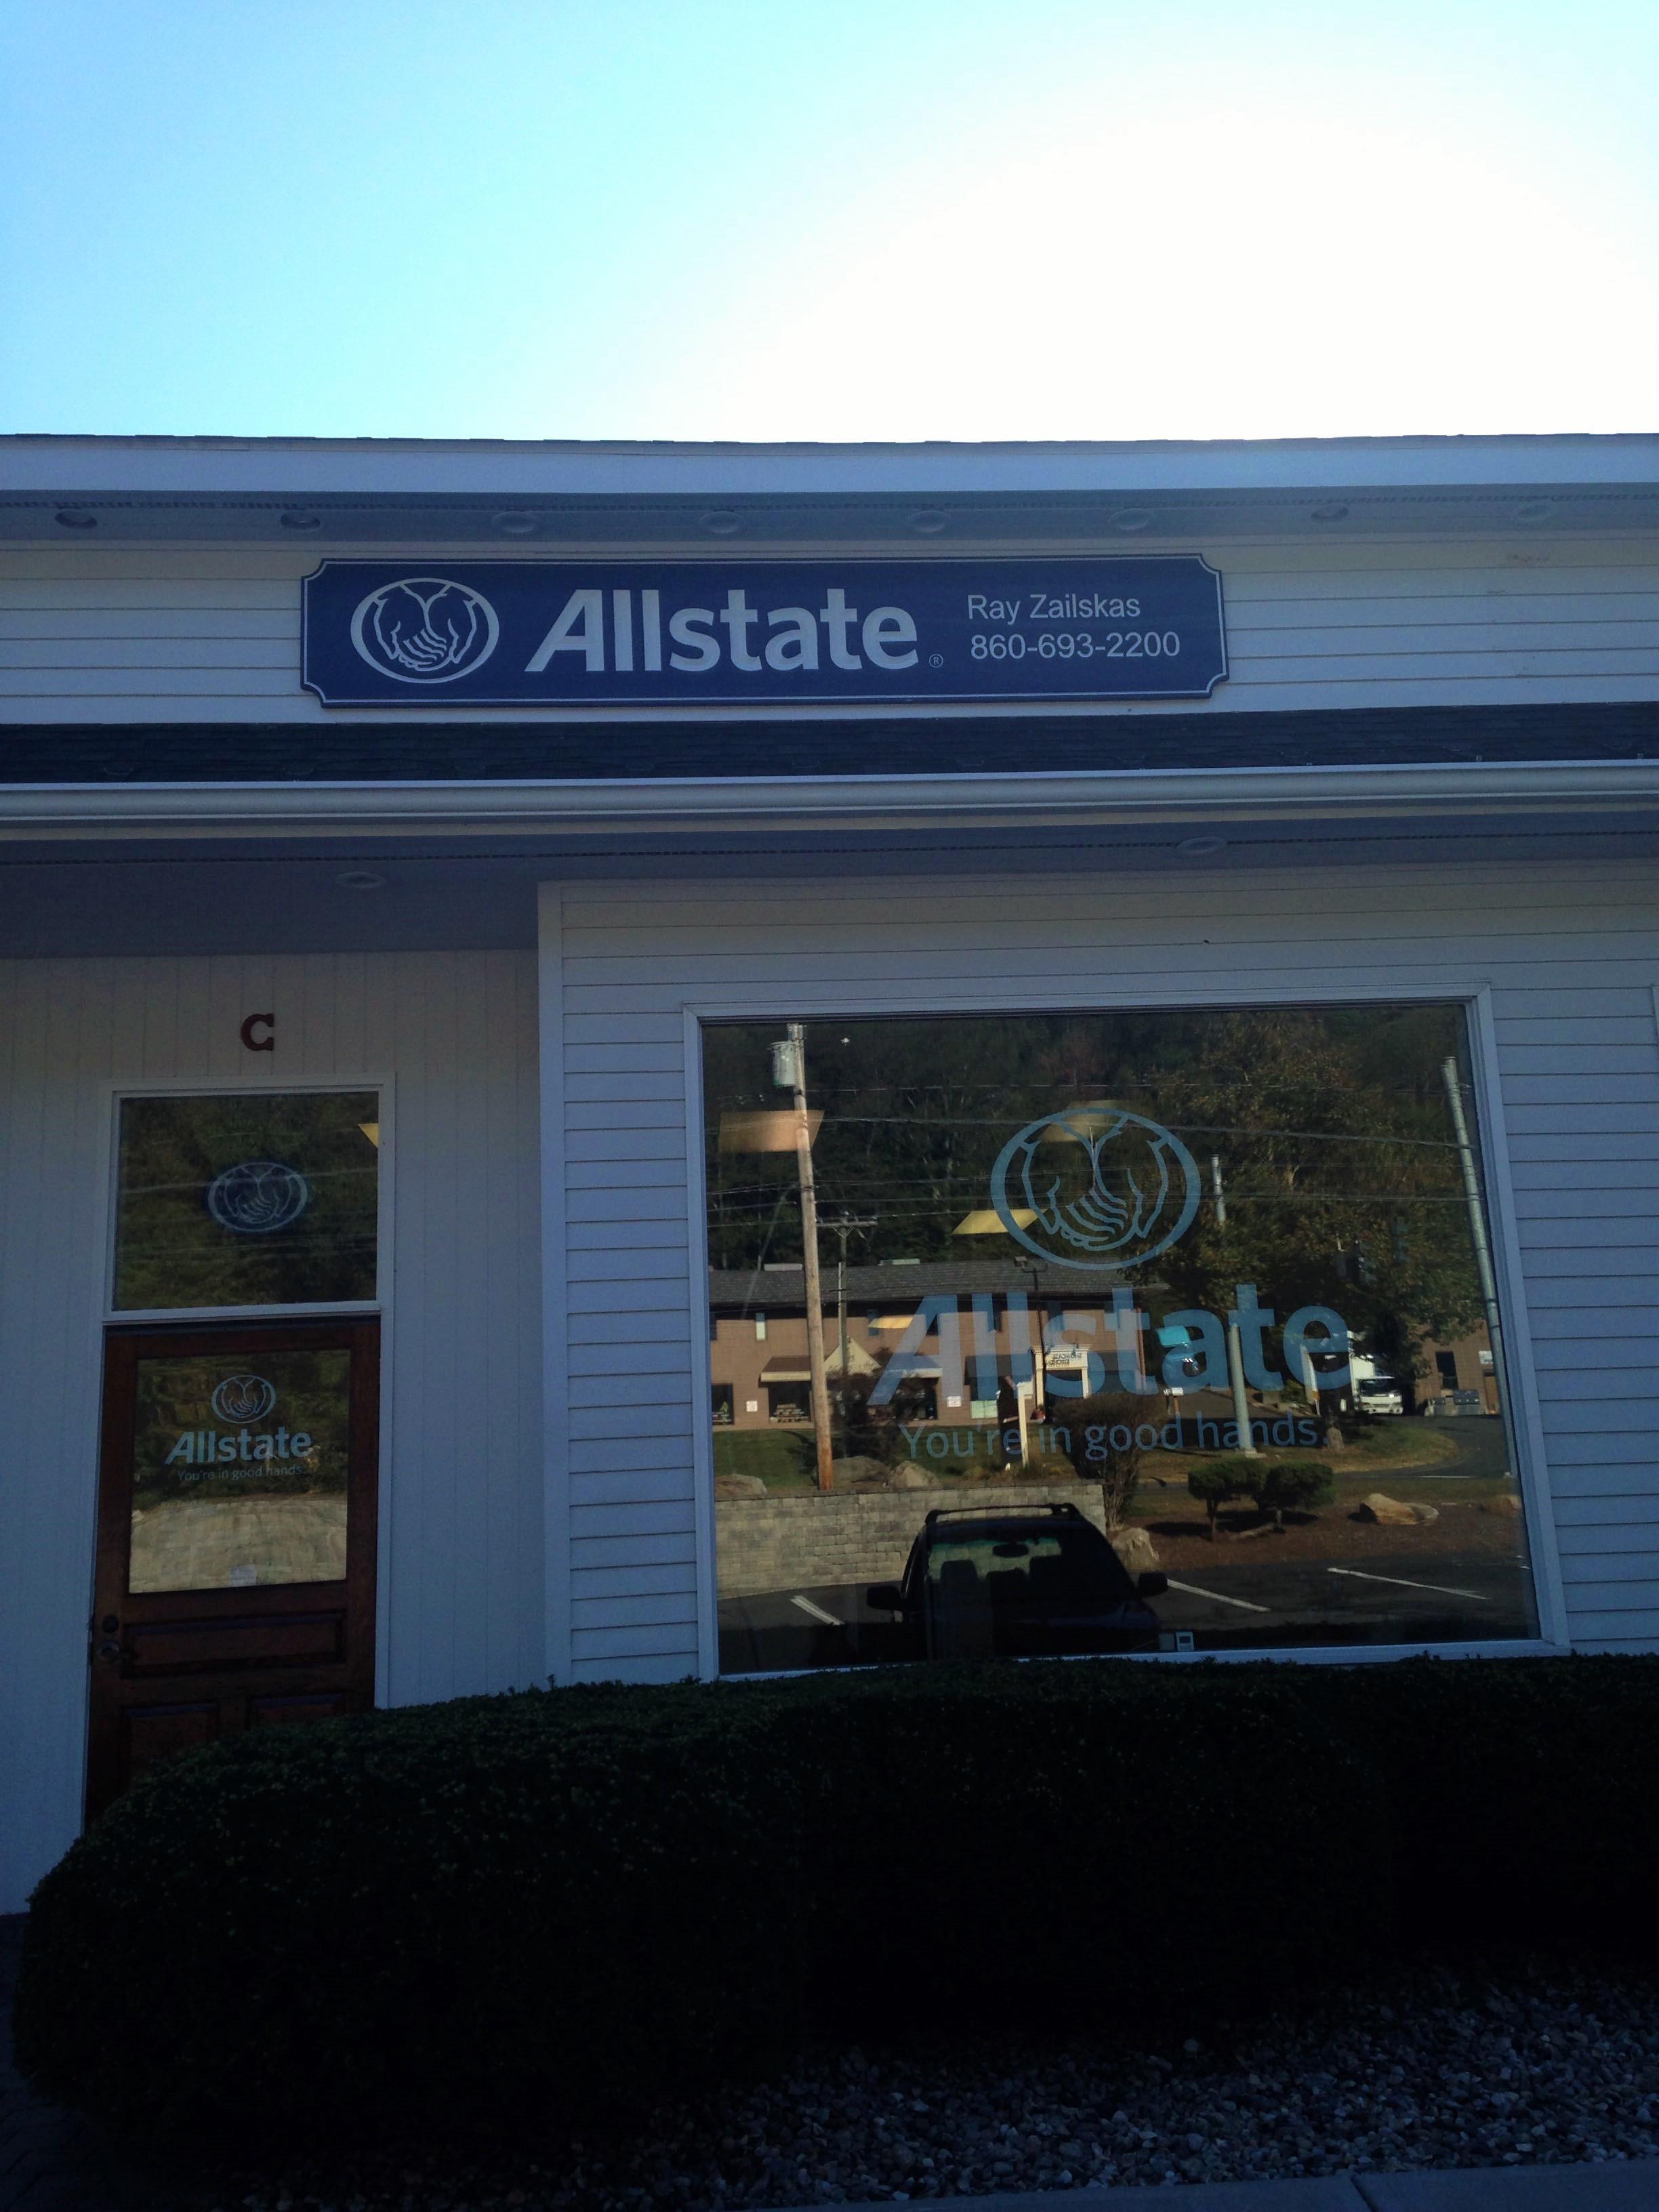 Ray Zailskas: Allstate Insurance image 1